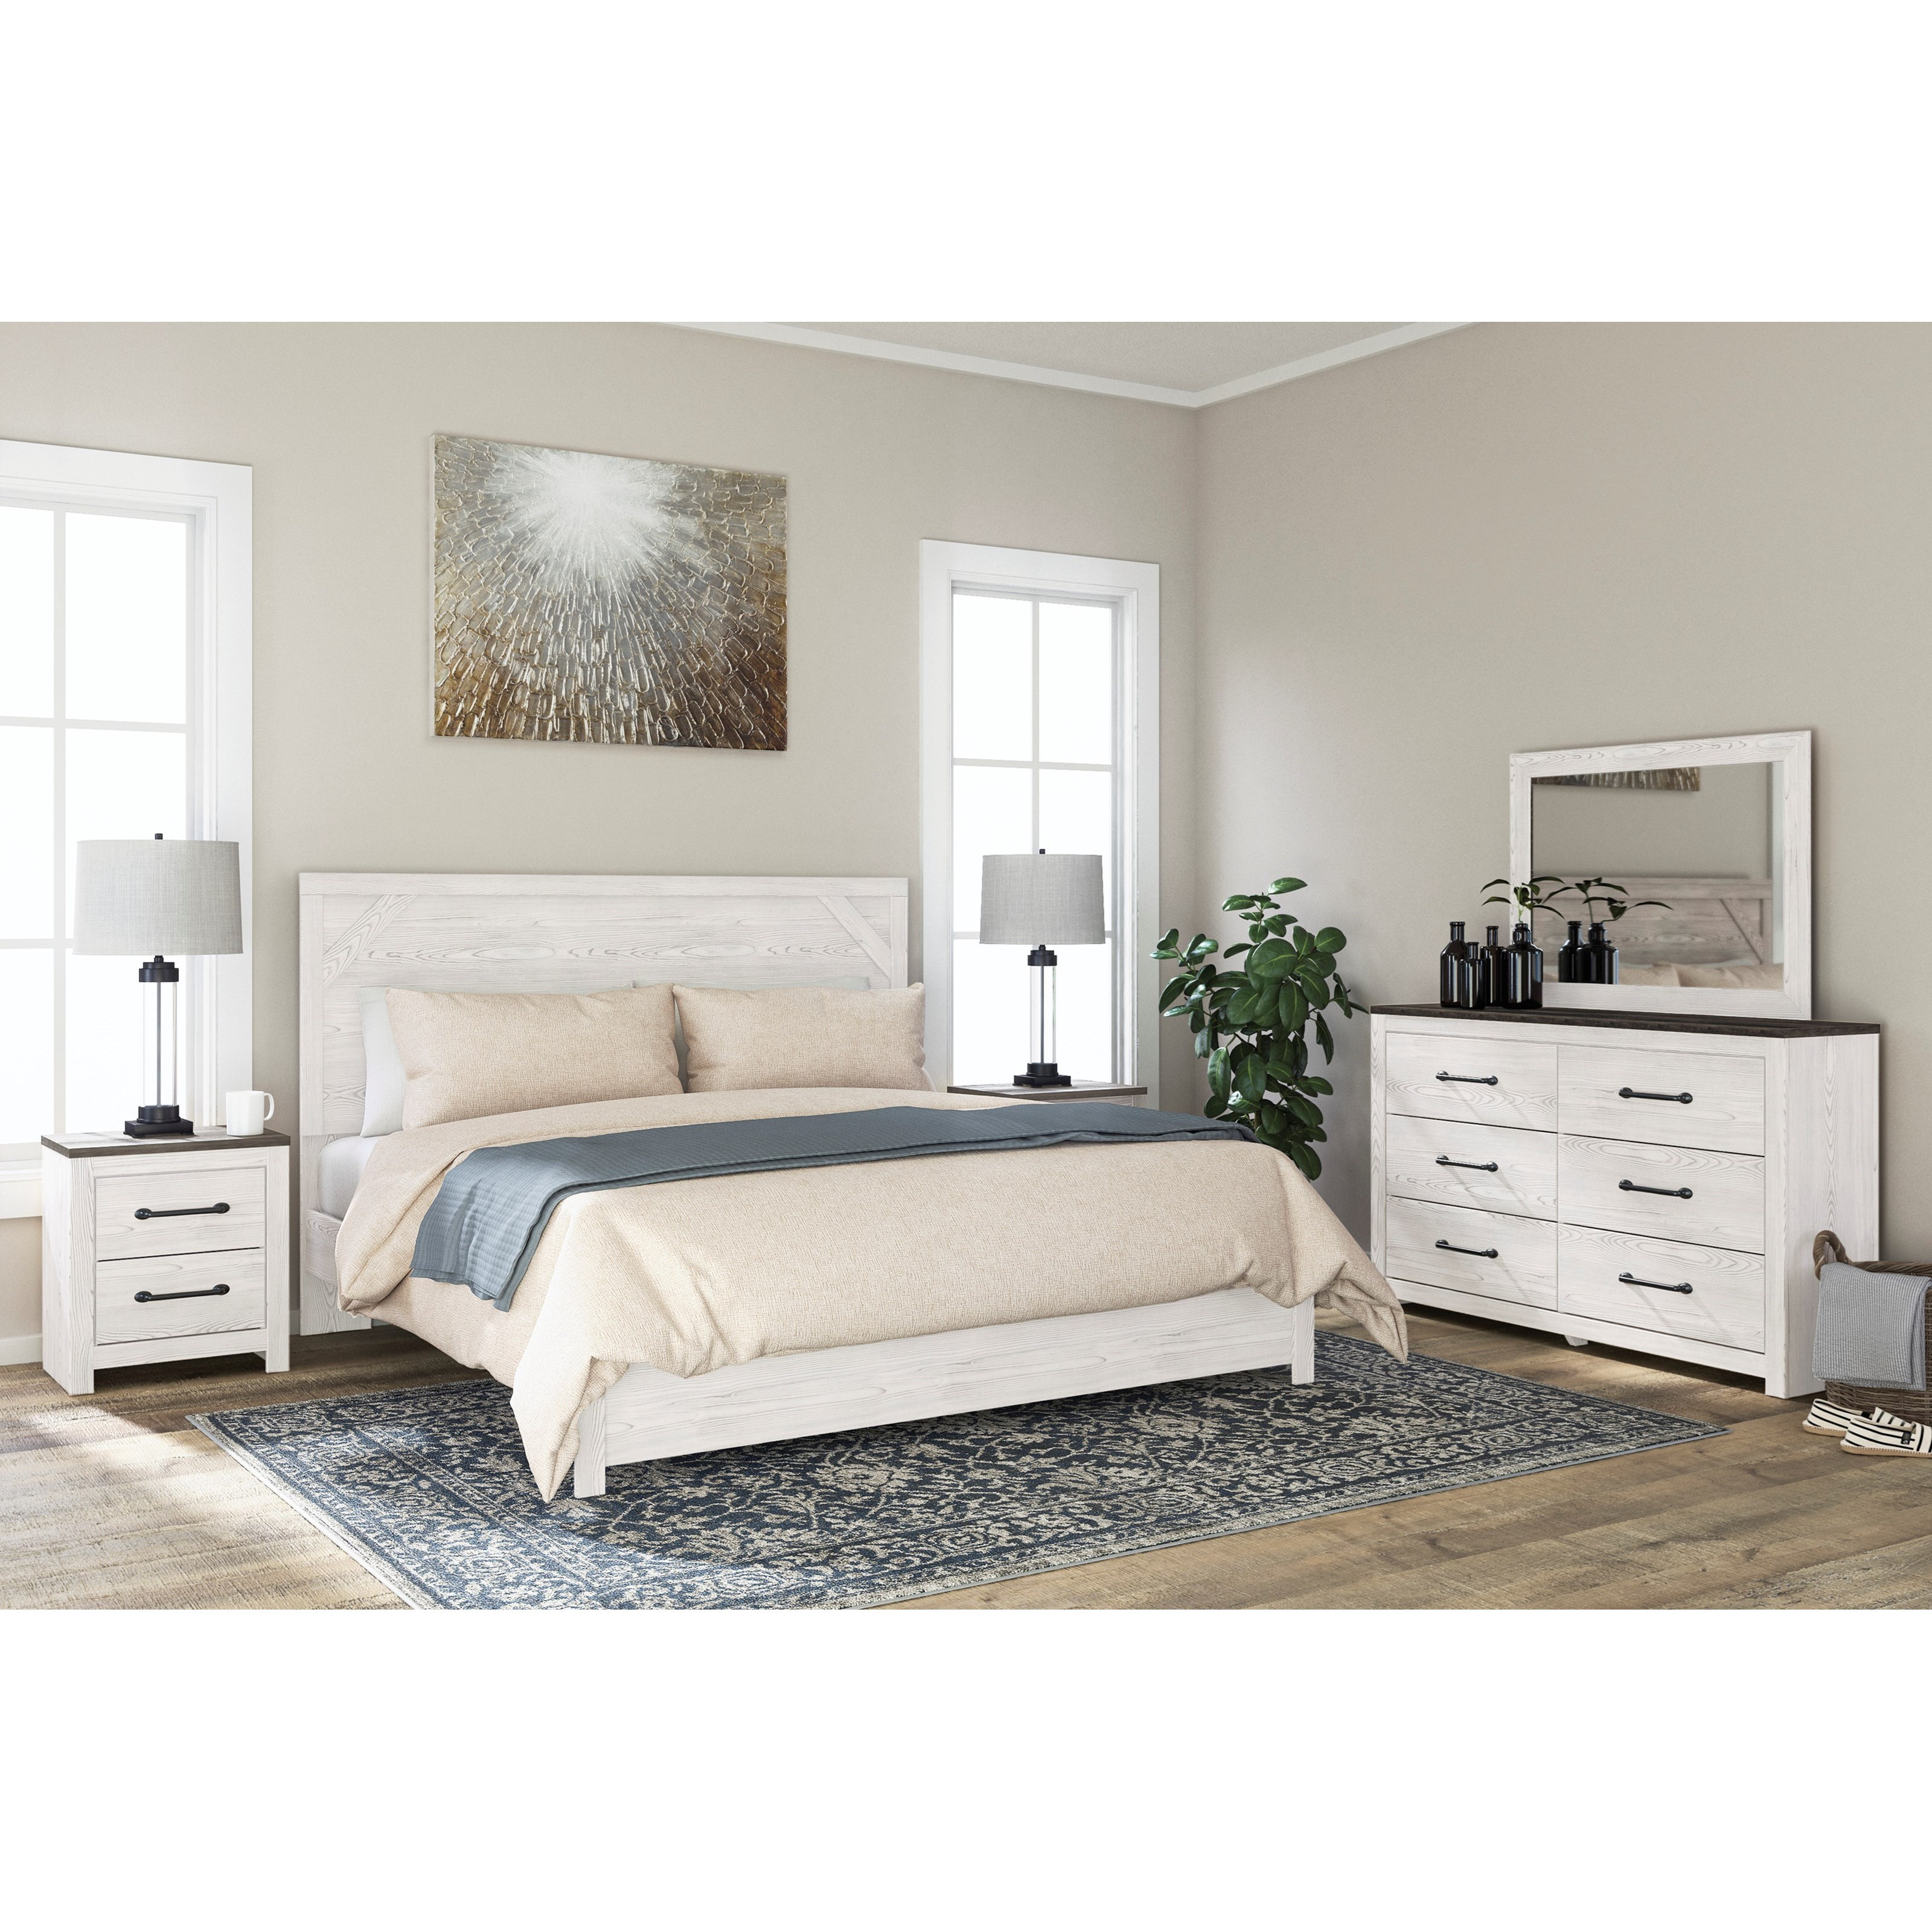 Gerridan King Bedroom Group by Ashley (Signature Design) at Johnny Janosik